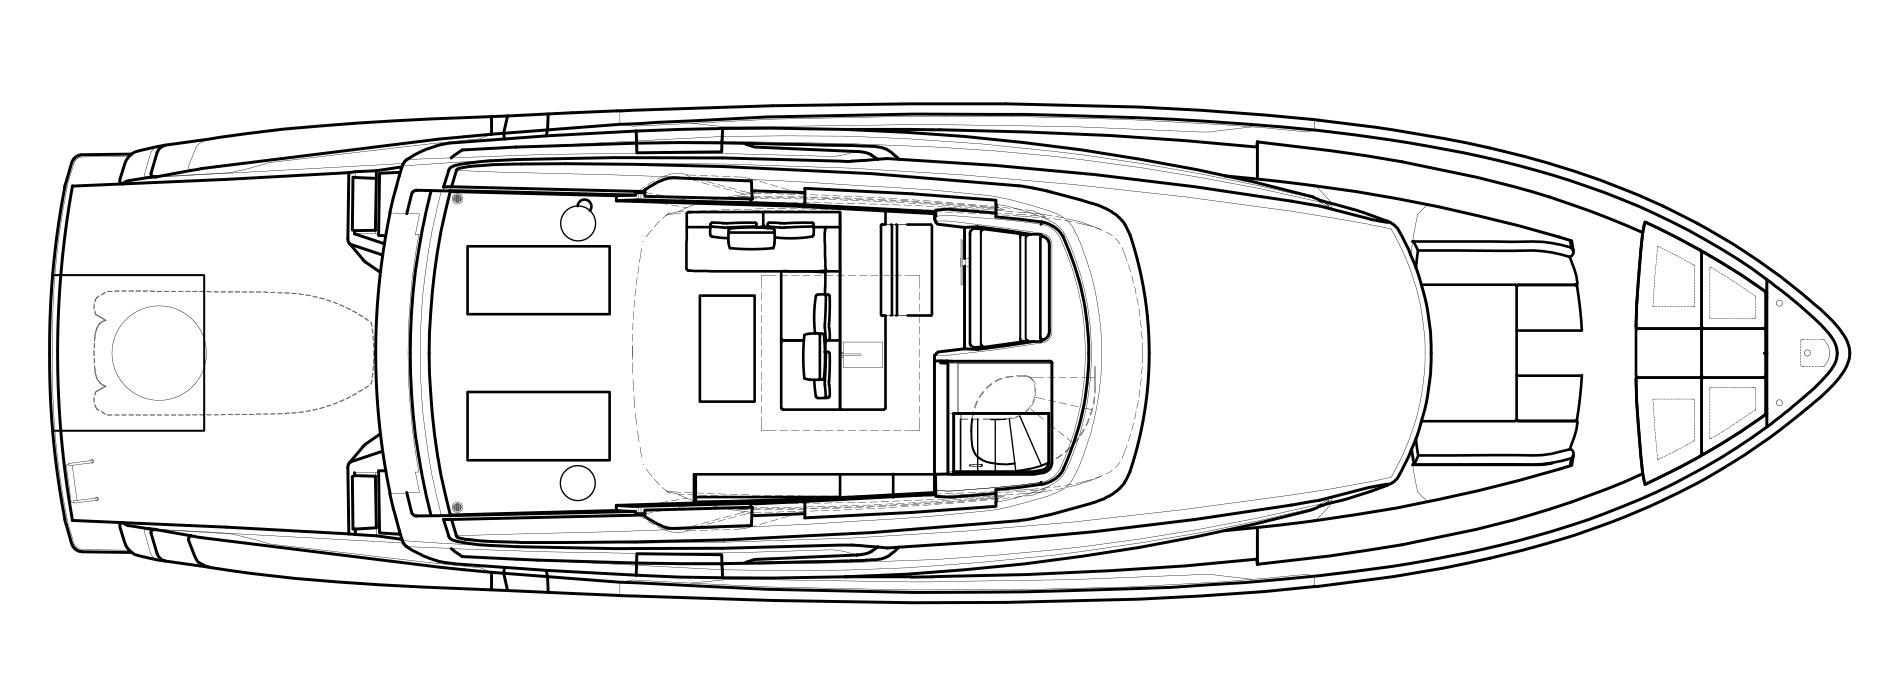 Sanlorenzo Yachts SX76 Flying bridge Version Lissoni